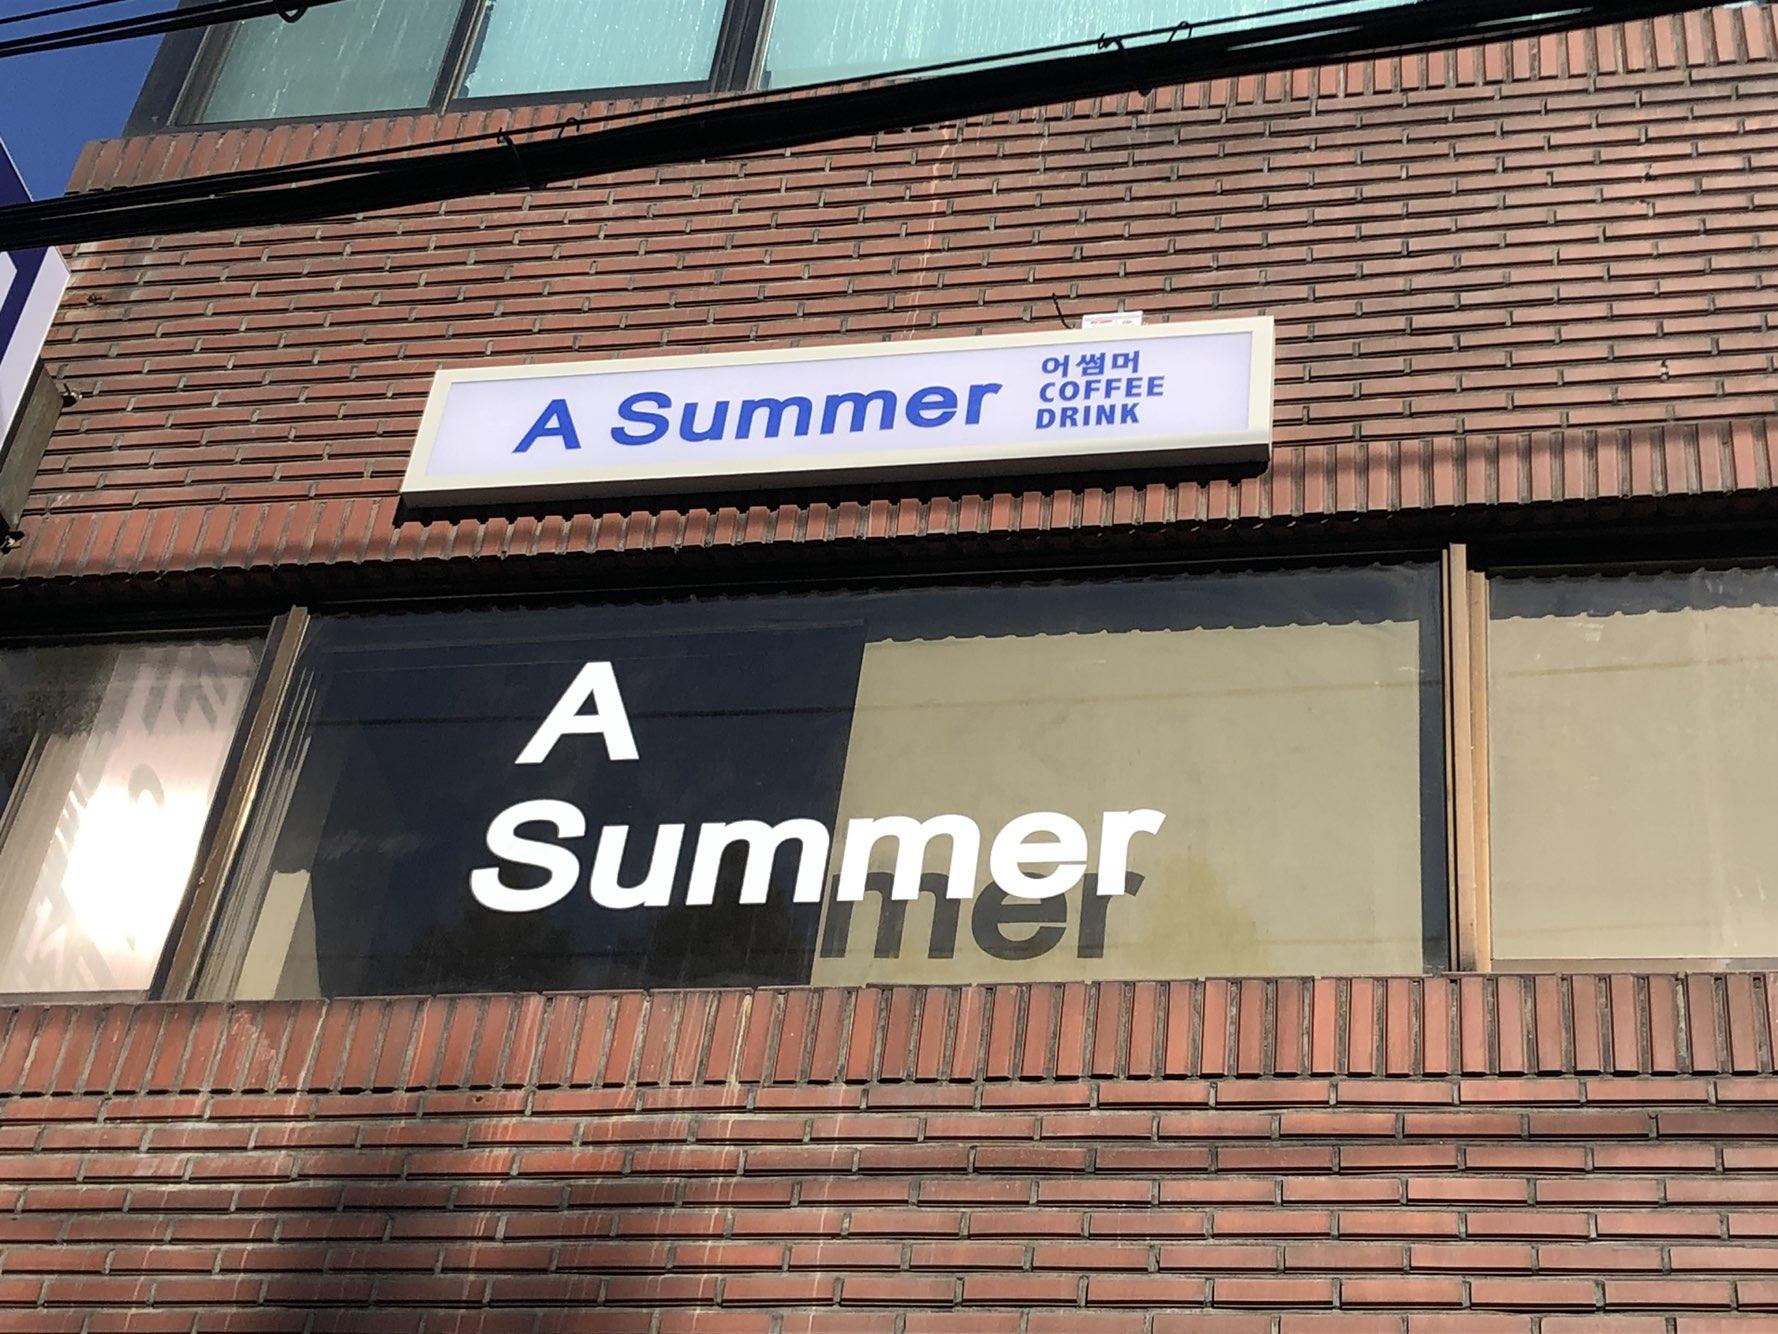 'A Summer'라는 문구와 파란색 간판만 보아도 시원하고 청량감이 느껴집니다.